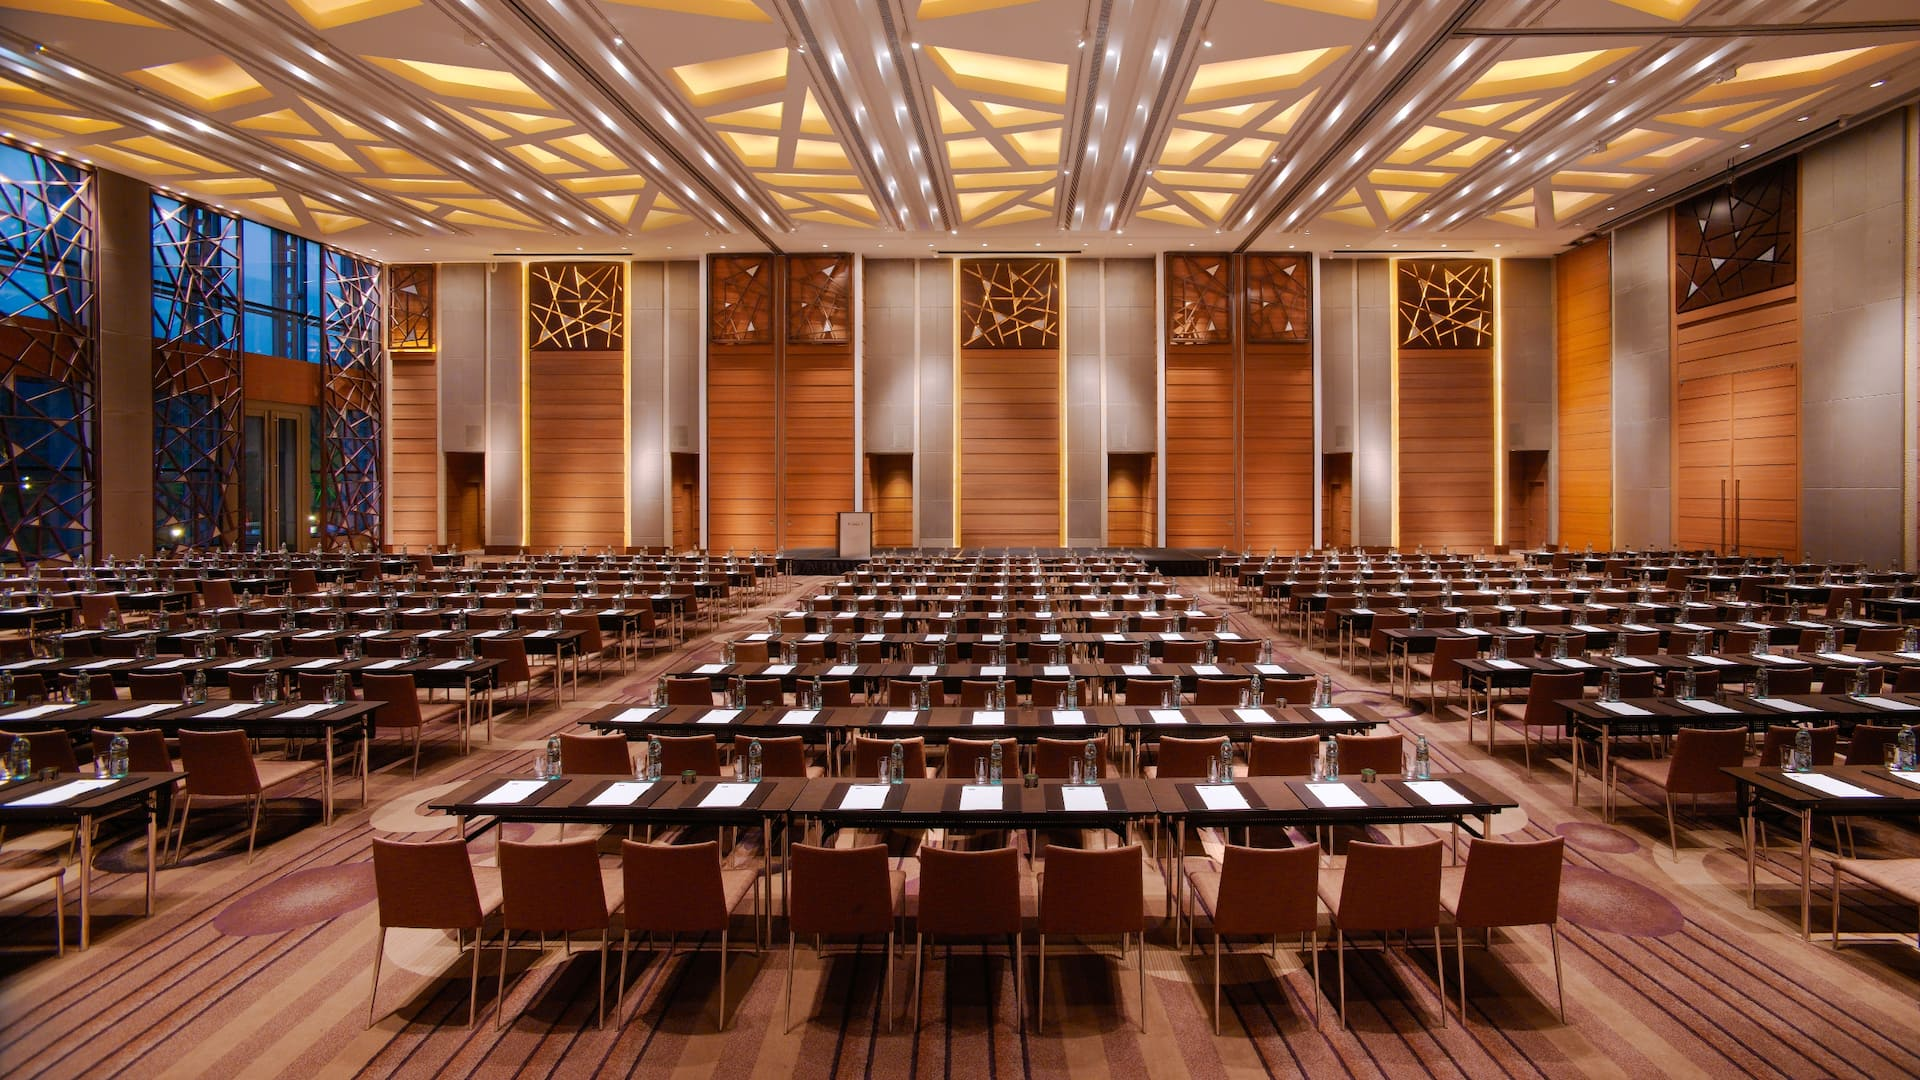 Ballroom classroom